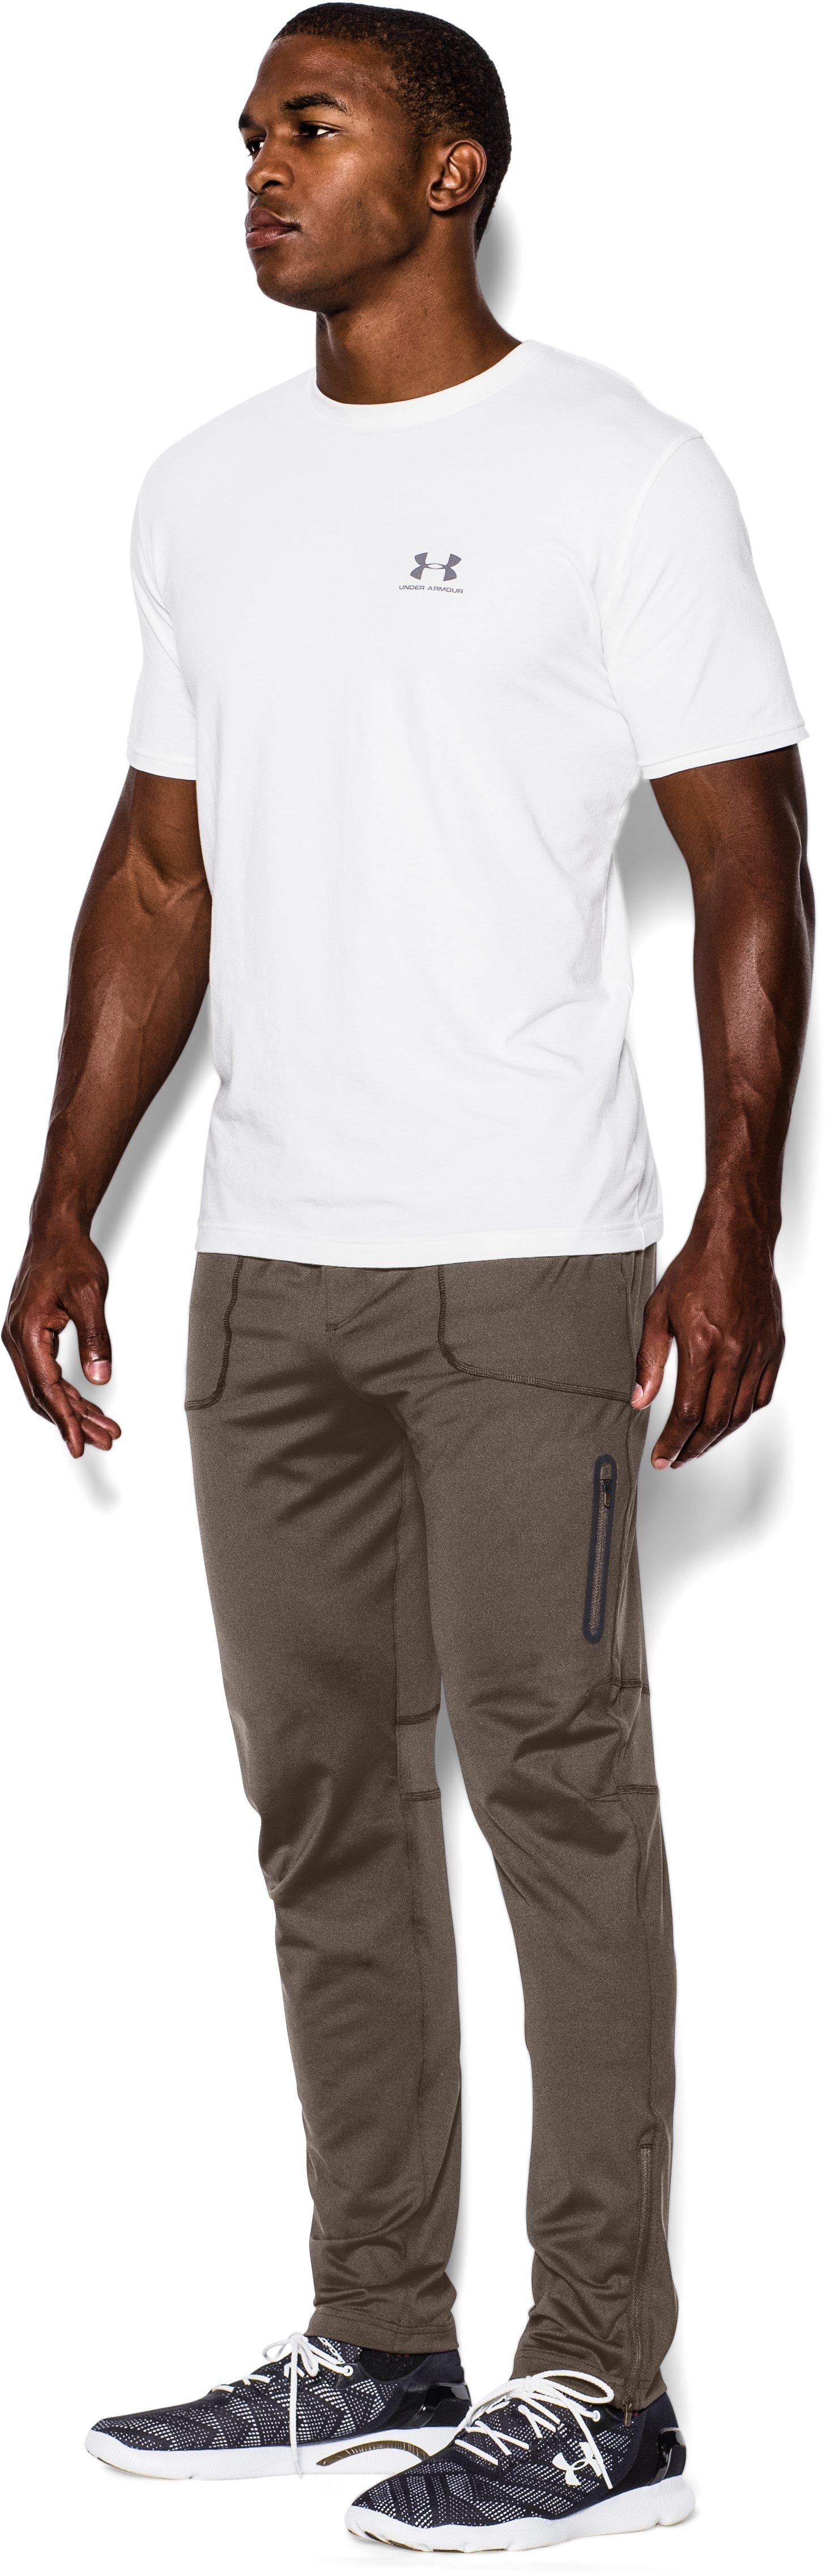 Men's UA Capital Knit Pants – Tapered Leg | Under Armour US